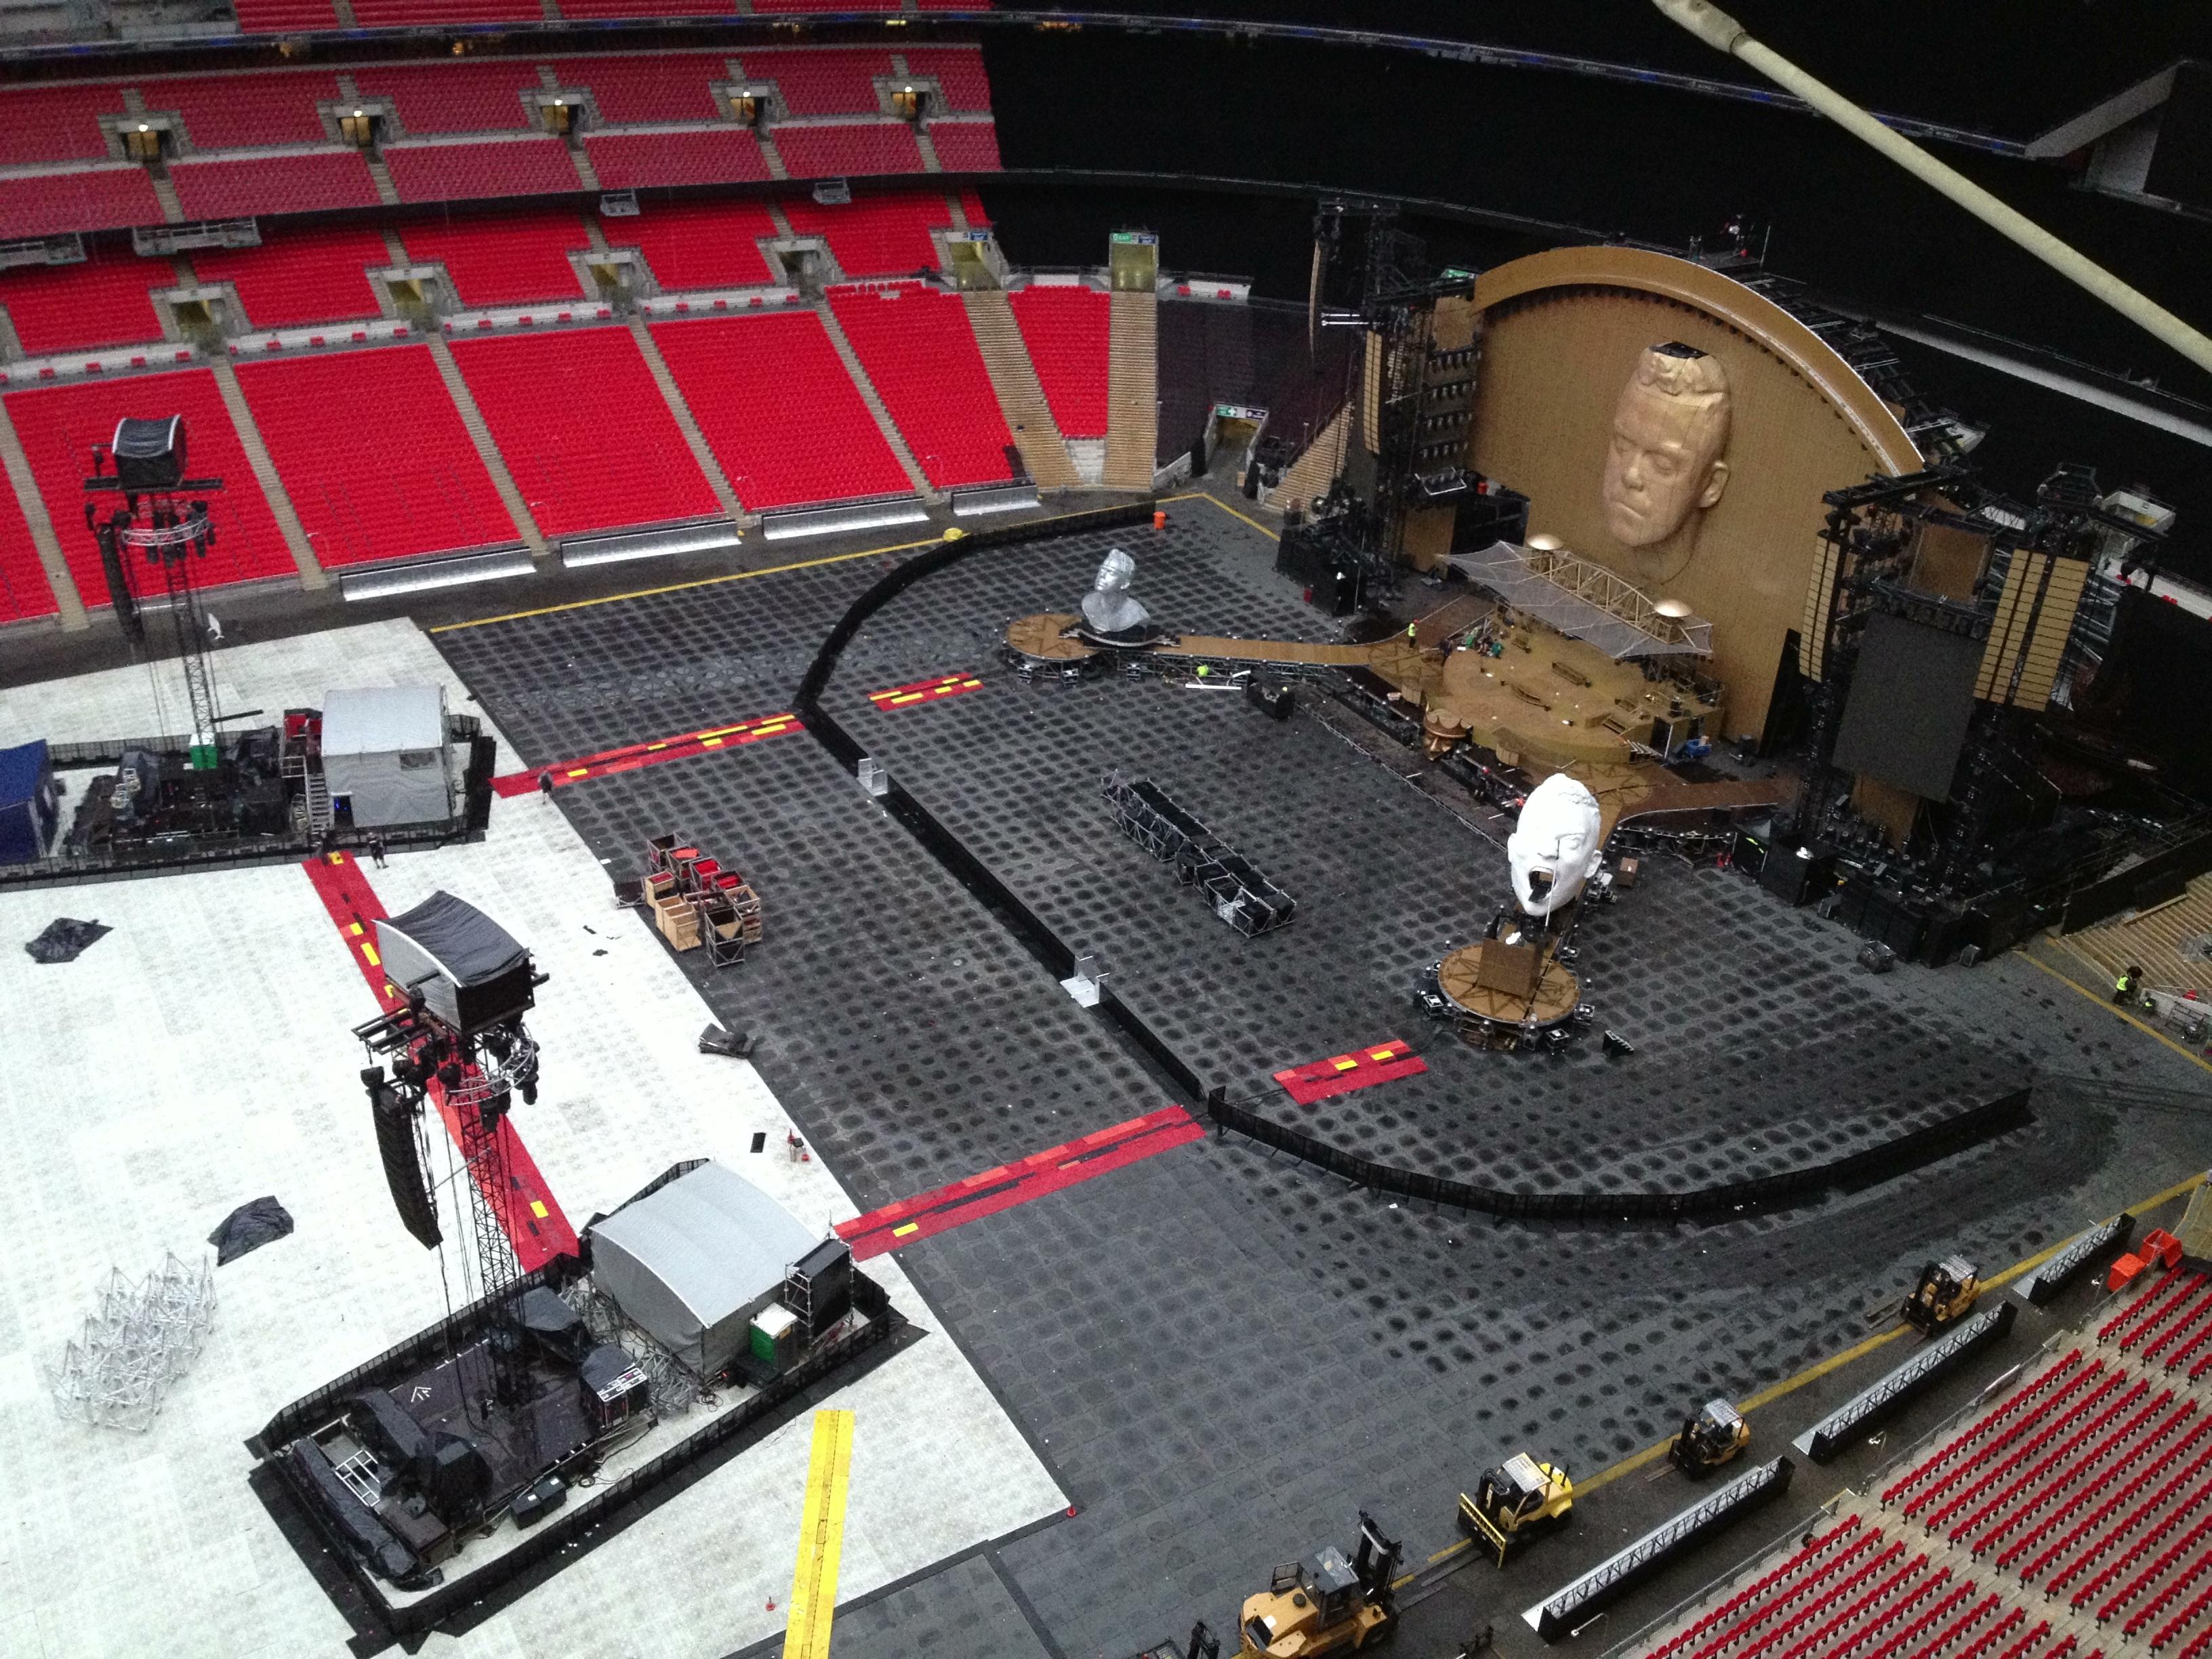 Robbie set up - by Pete McGlynn